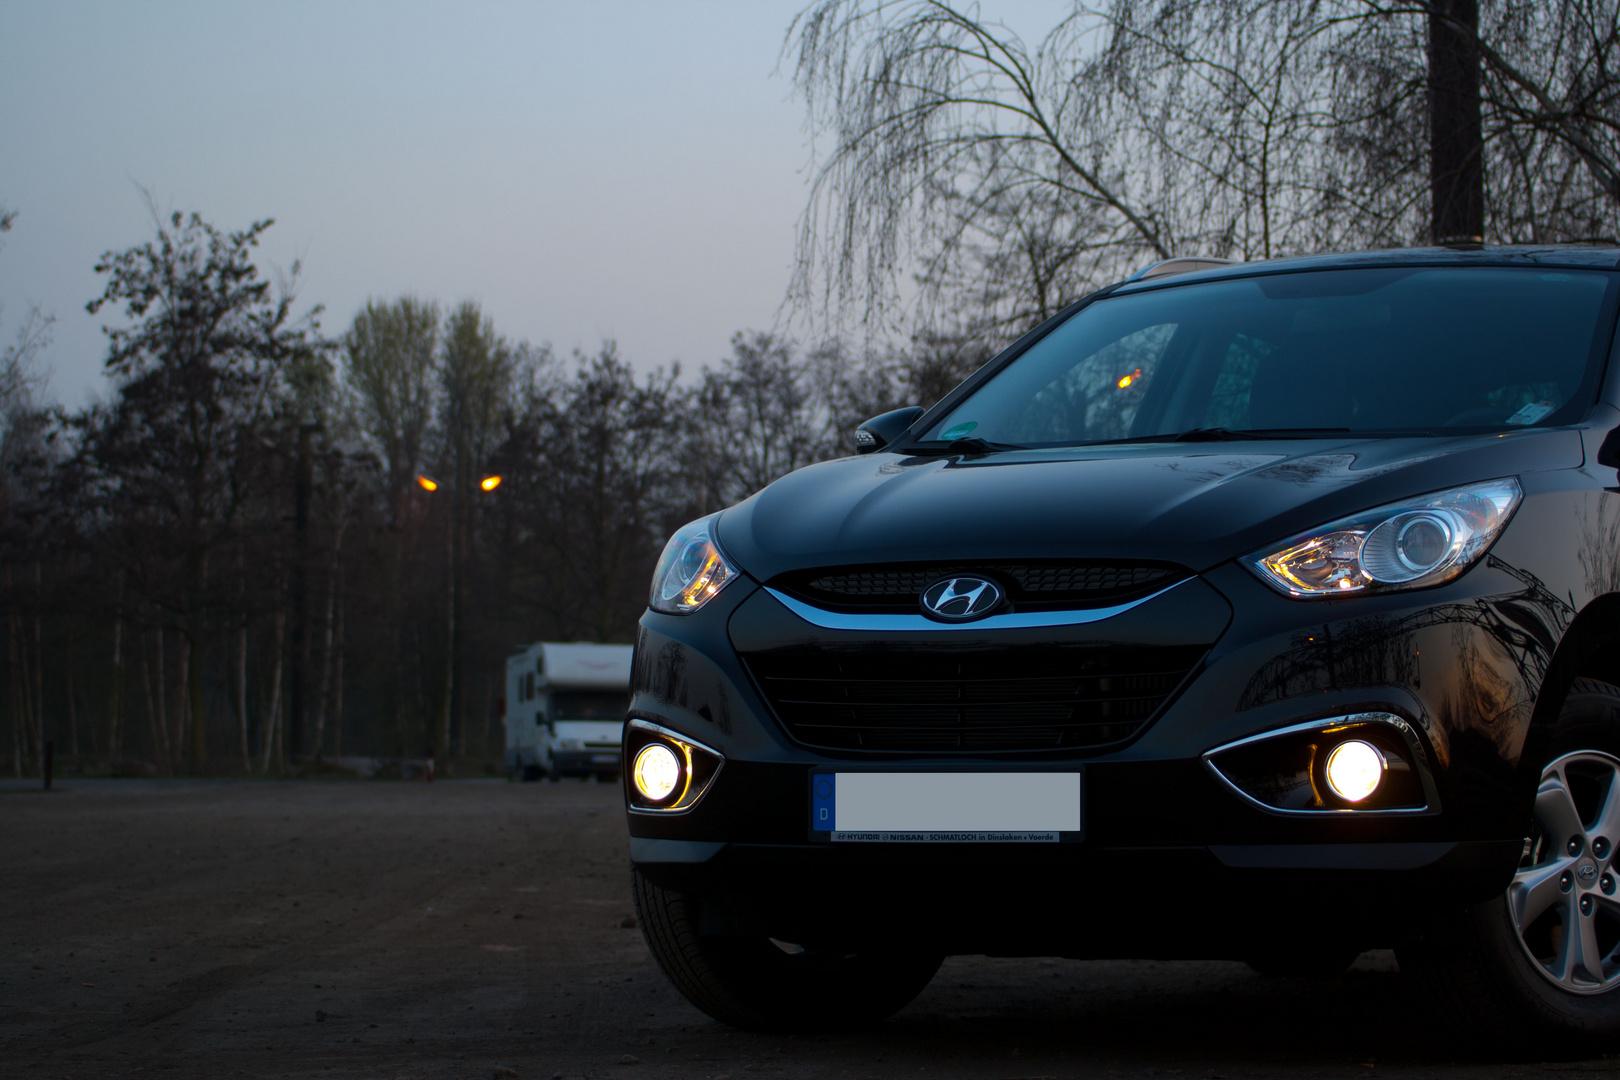 Hyundai IX35 HDR Fotorealistisch